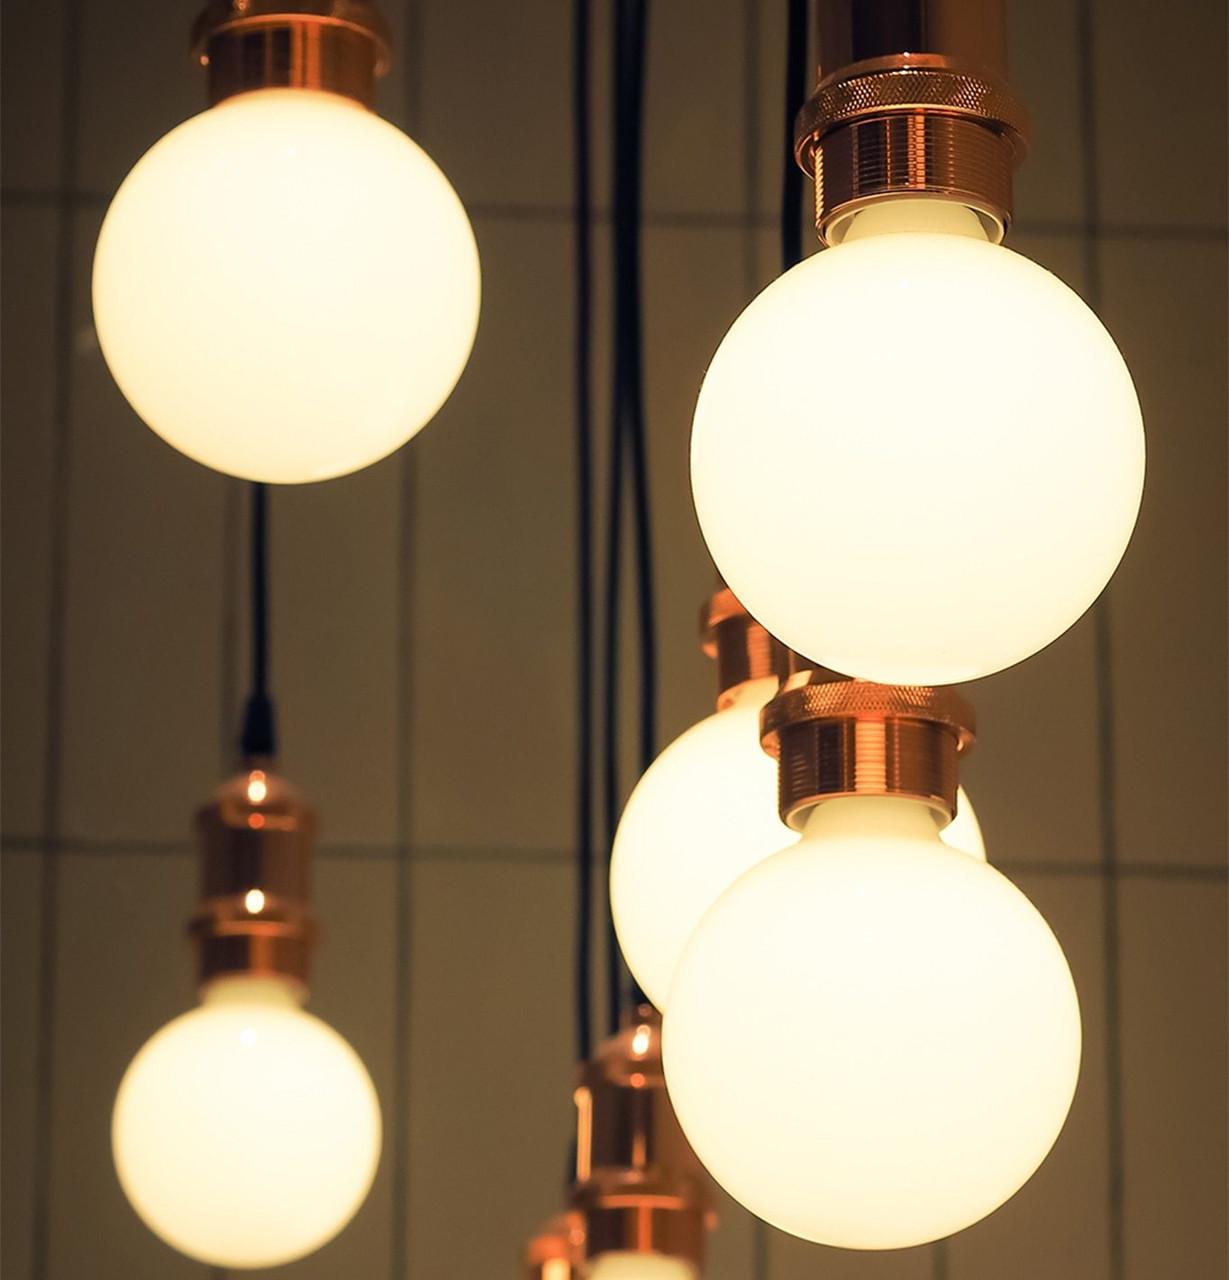 LED Dimmable G80 BC Light Bulbs